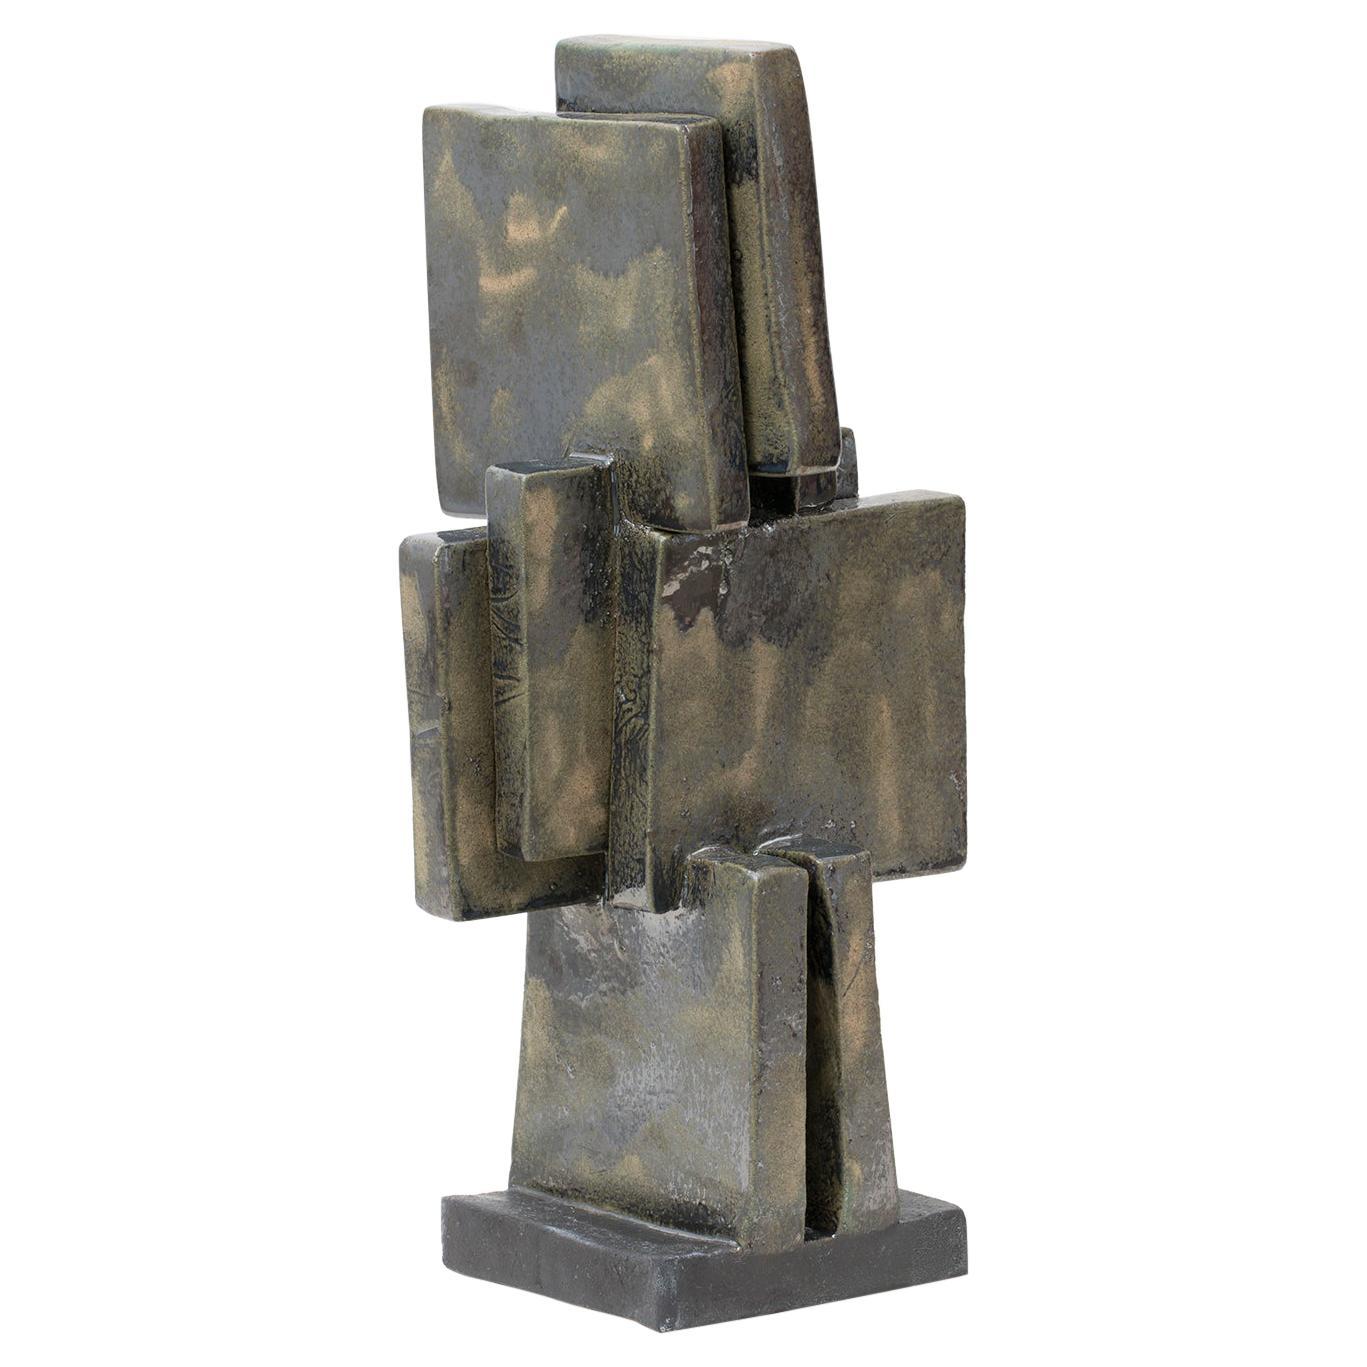 Modernist Ceramic Sculpture by Judy Engel